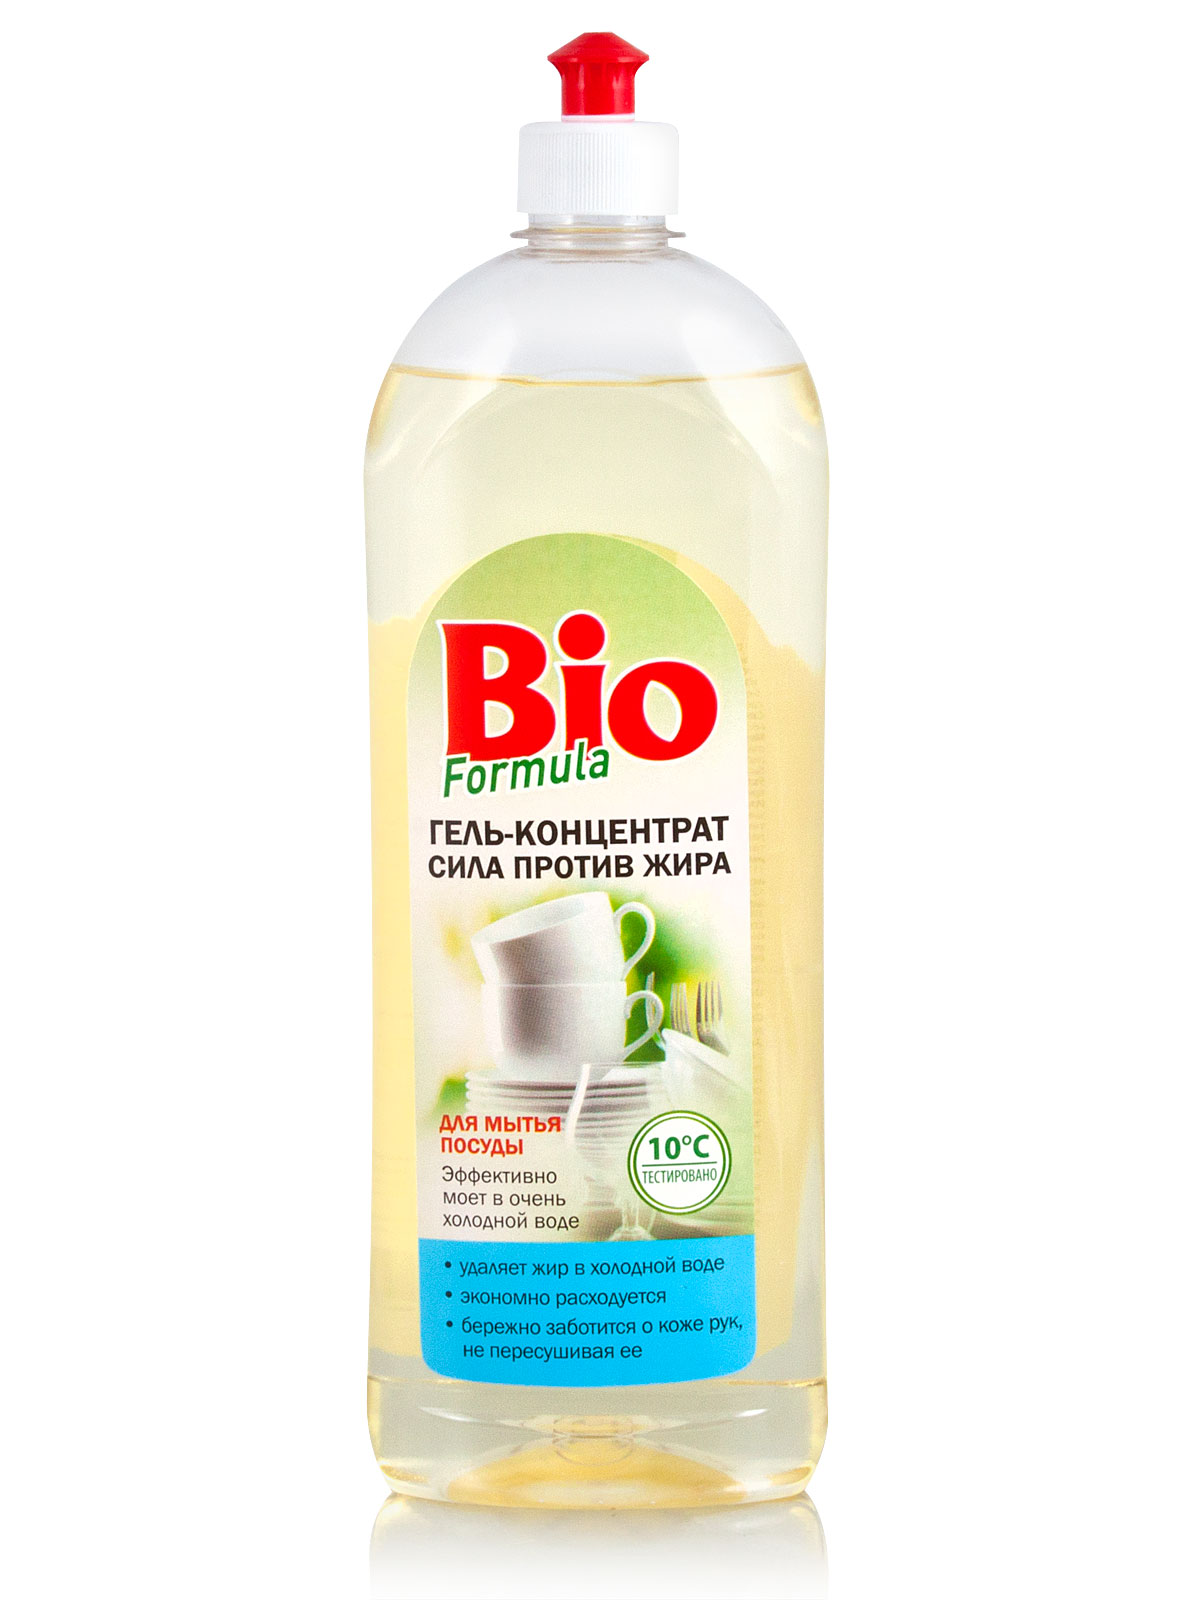 bio BIO Formula Сила против жира 750мл (4823015932724)